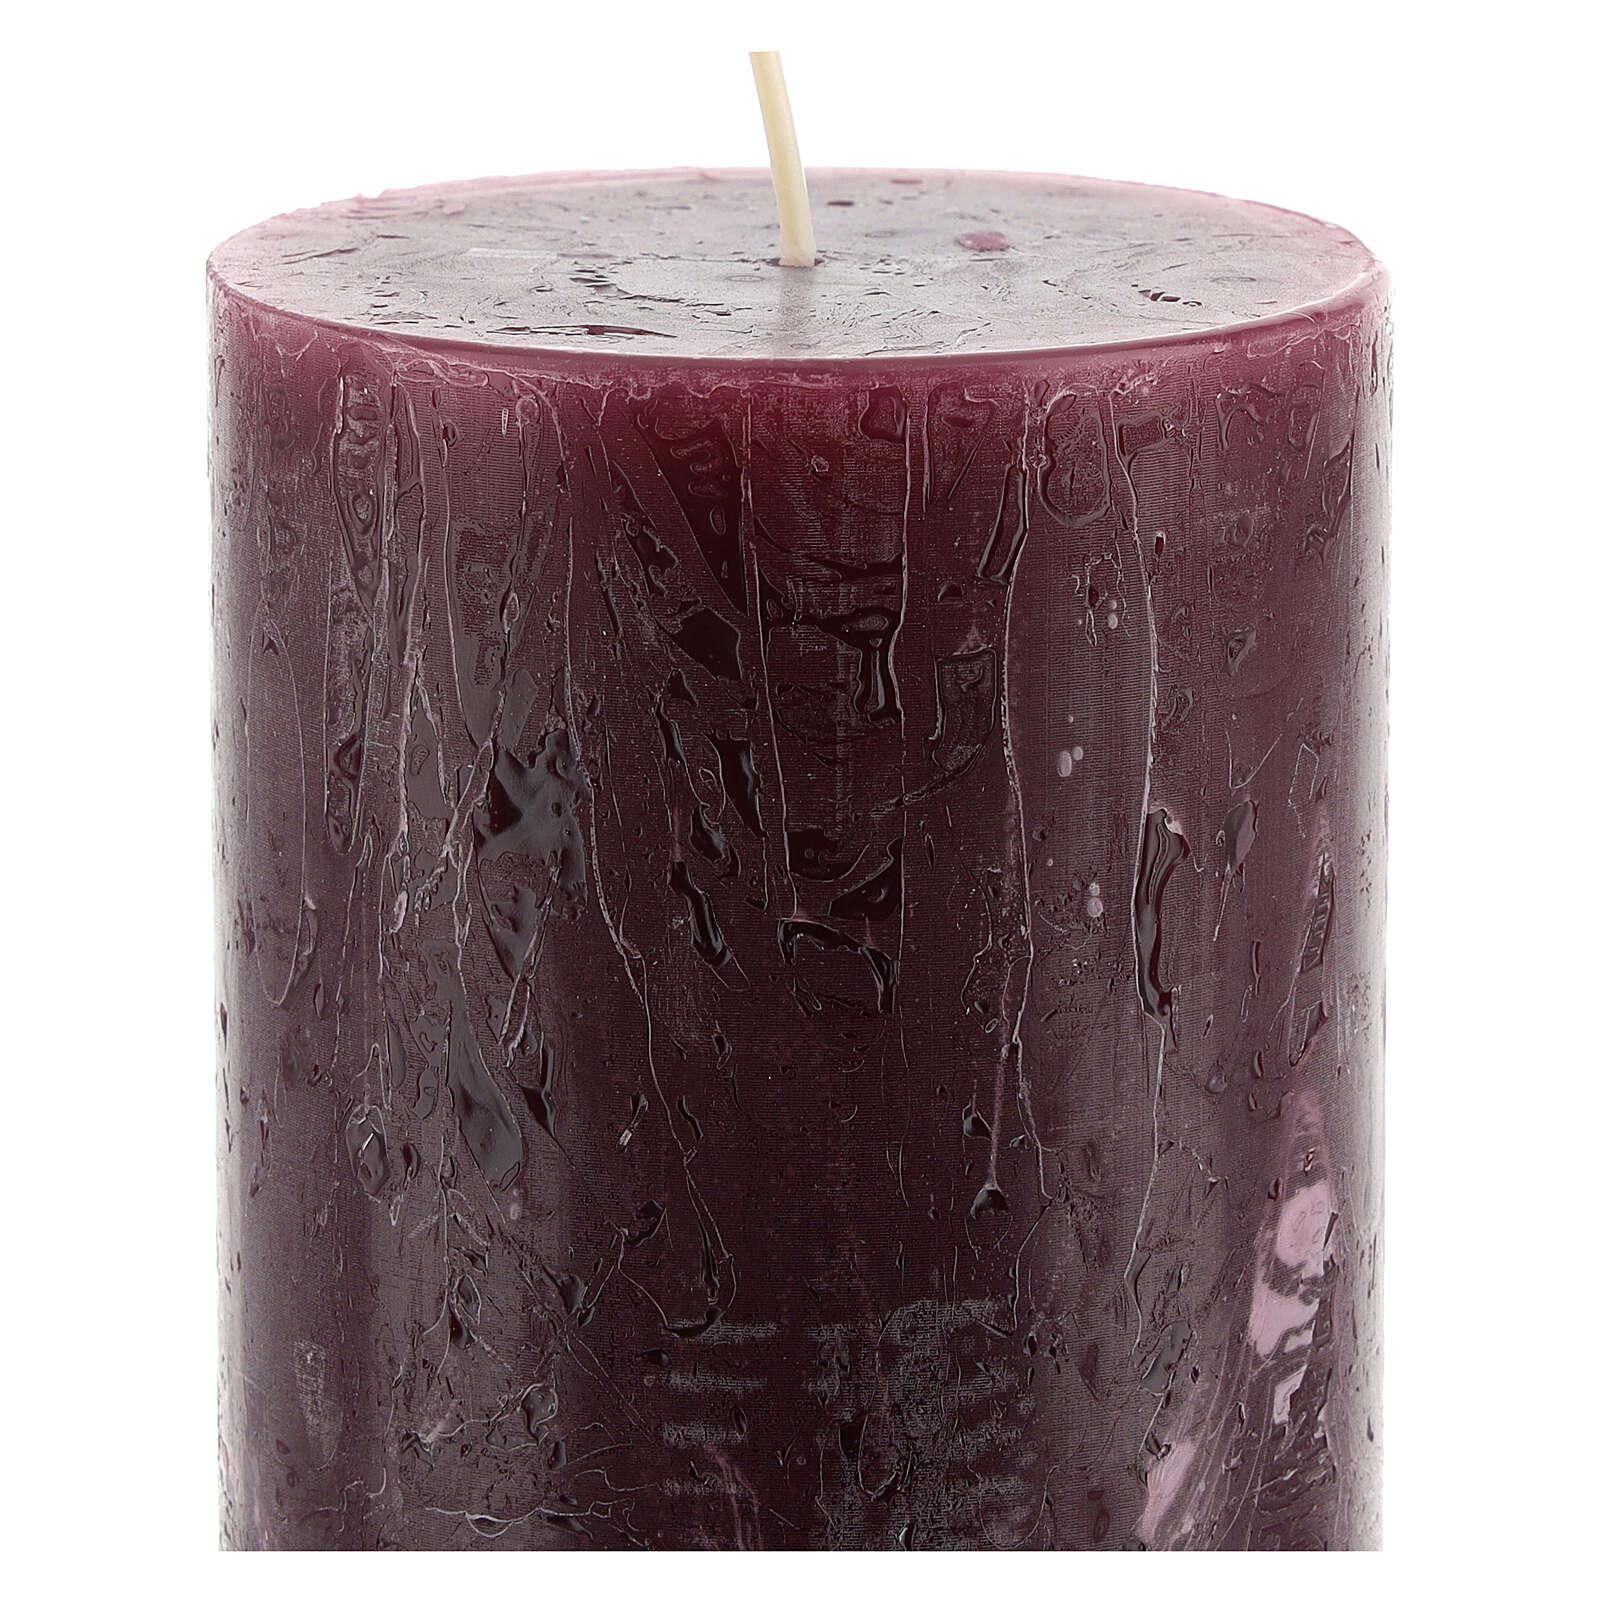 Kerzen rustikaler Stil 12 Stück violett, 140x80 mm 3